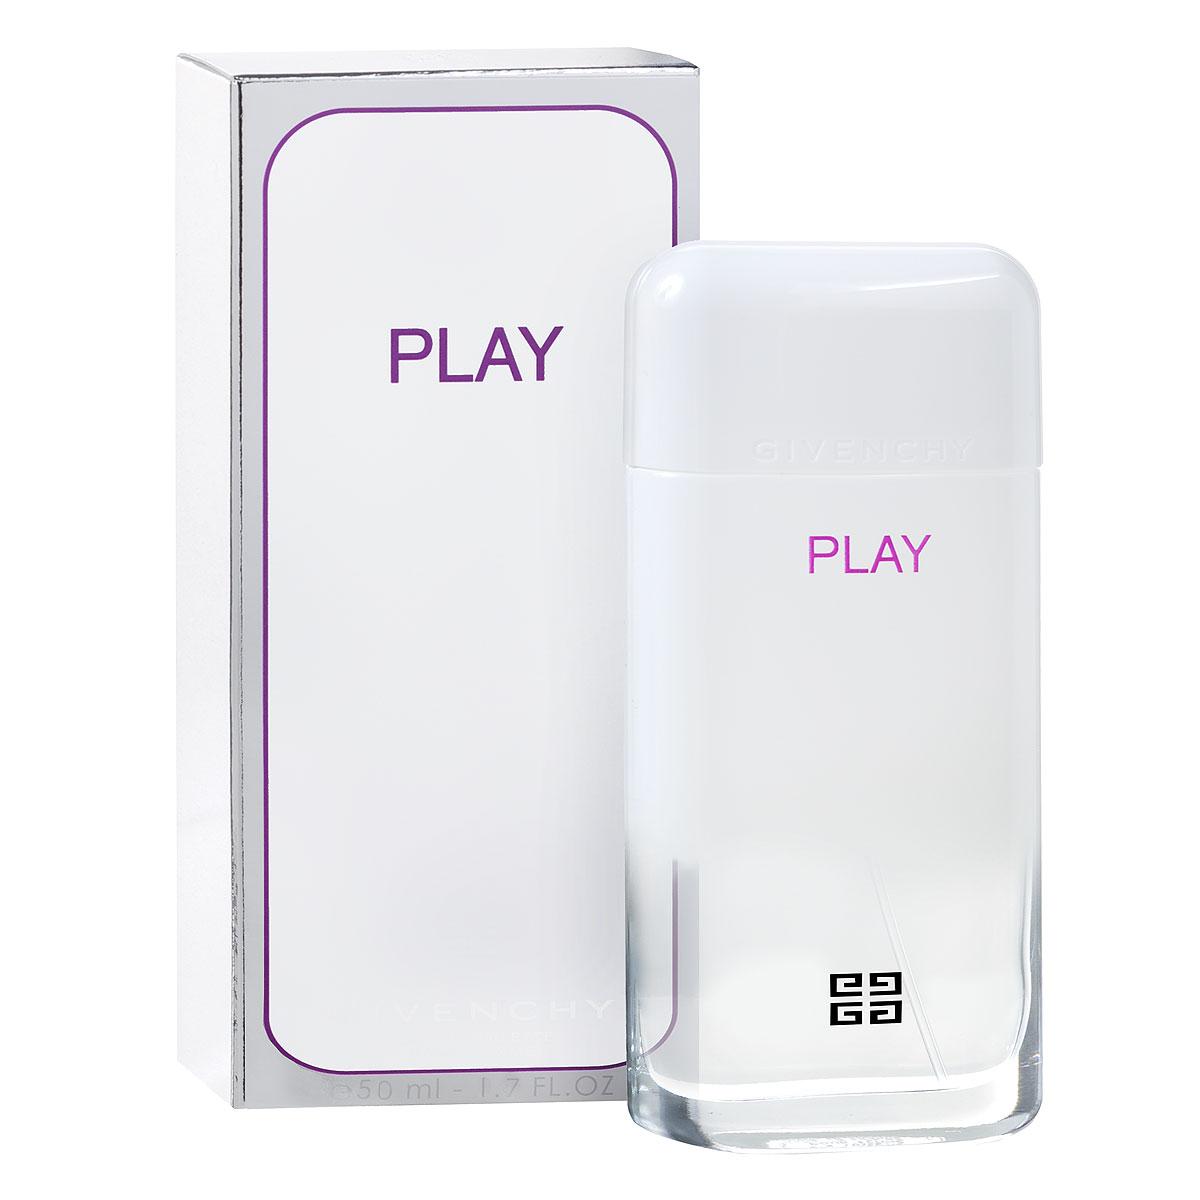 Givenchy Туалетная вода Play For Her Eau de Toilette, женская, 50 мл